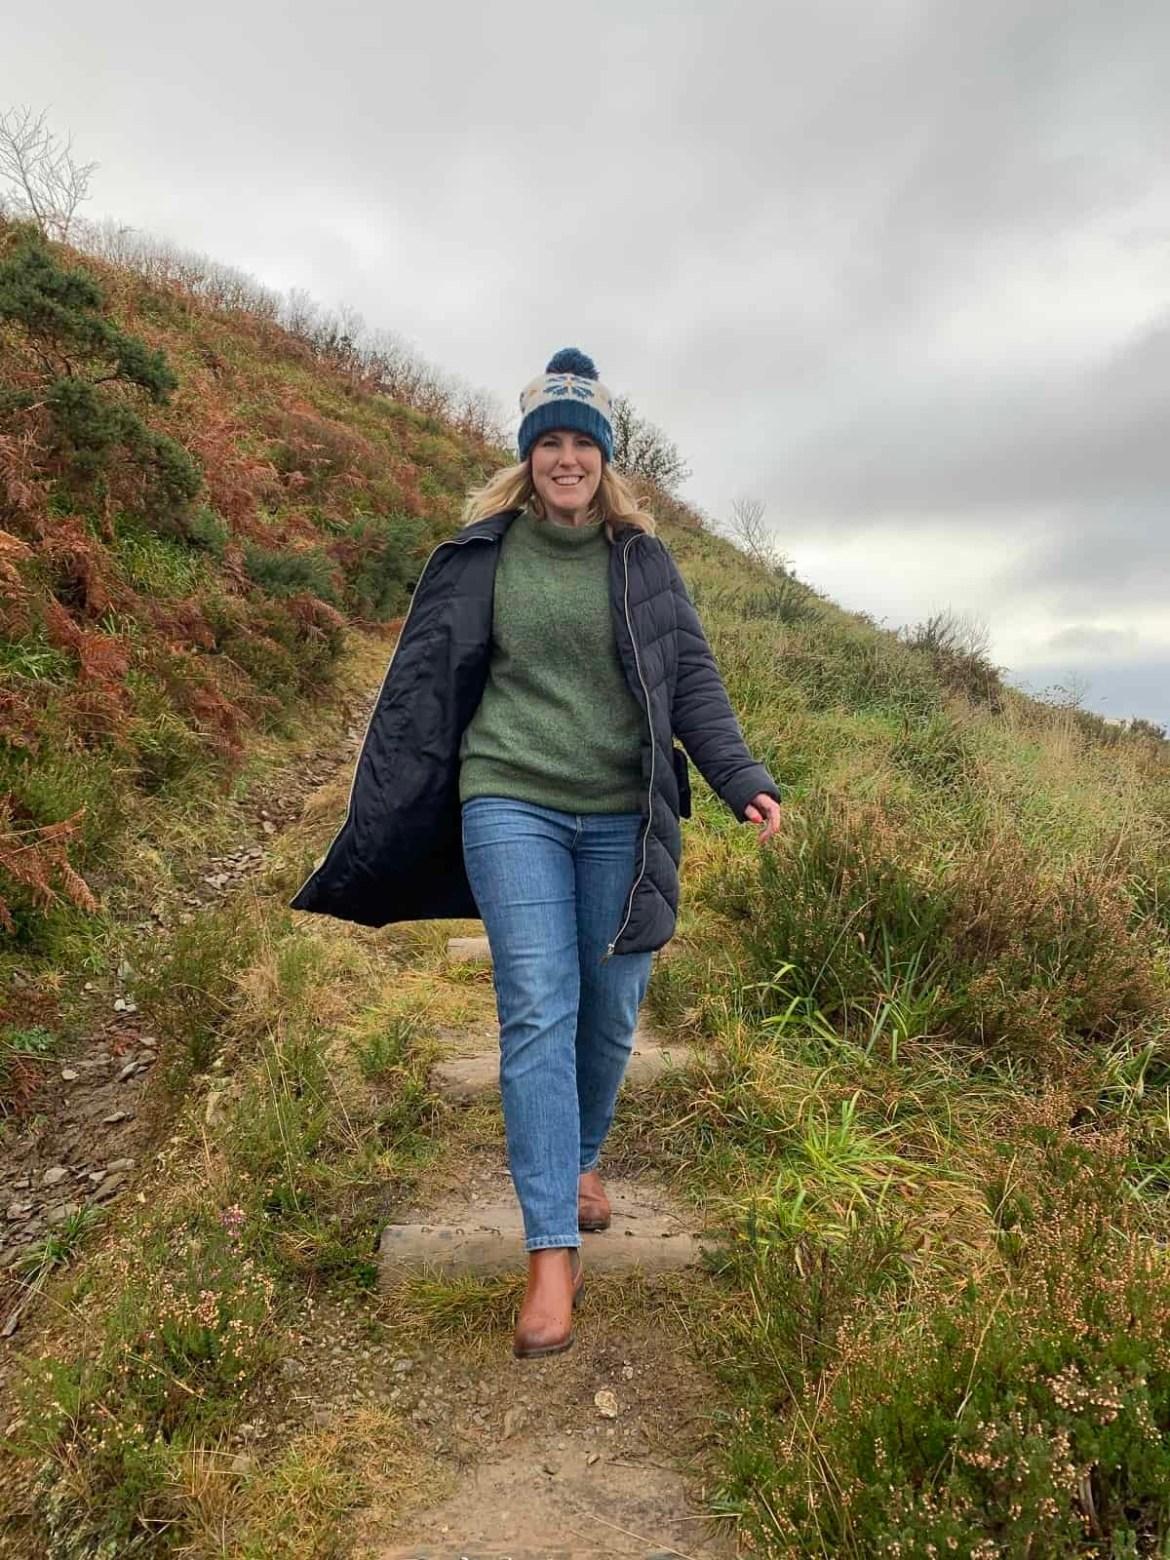 Country walk in Ballina